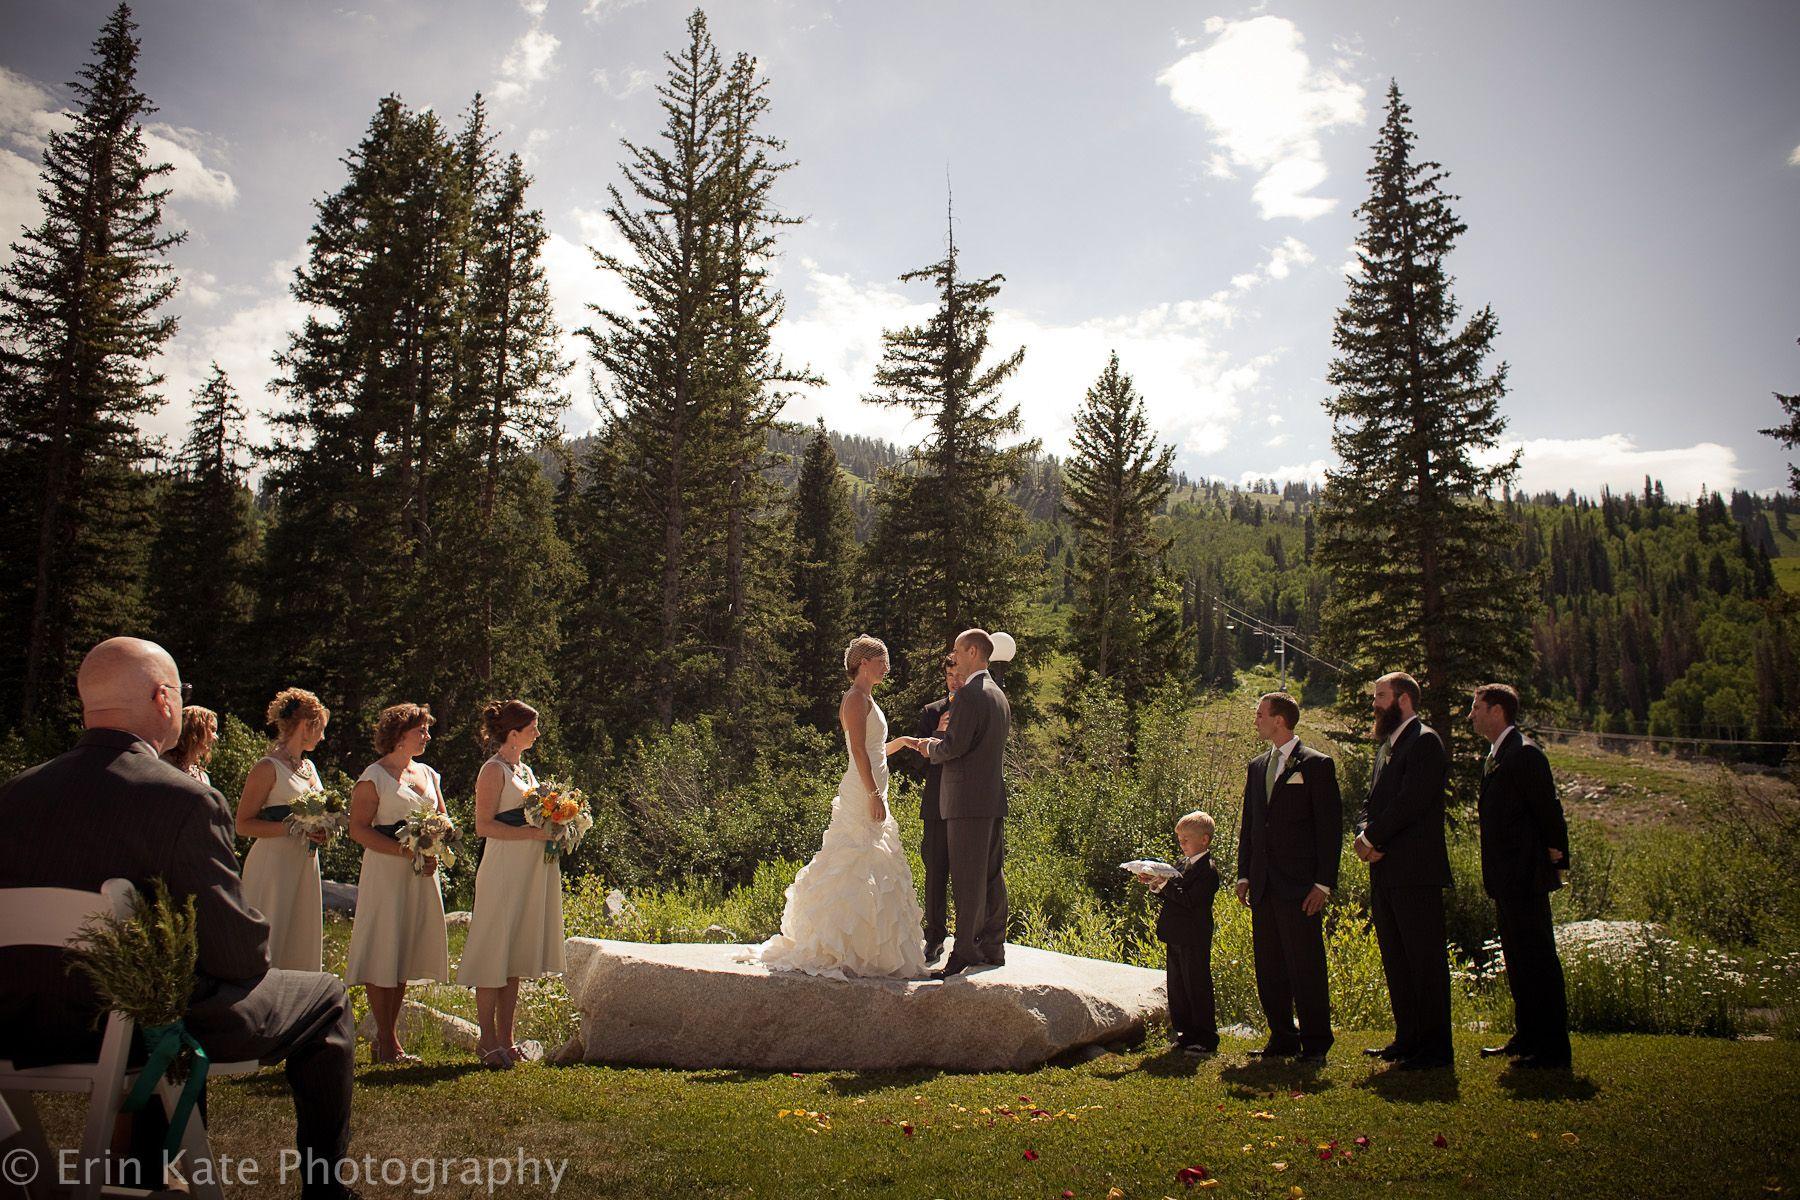 Beautiful mountain wedding at Solitude Mountain Resort in ...